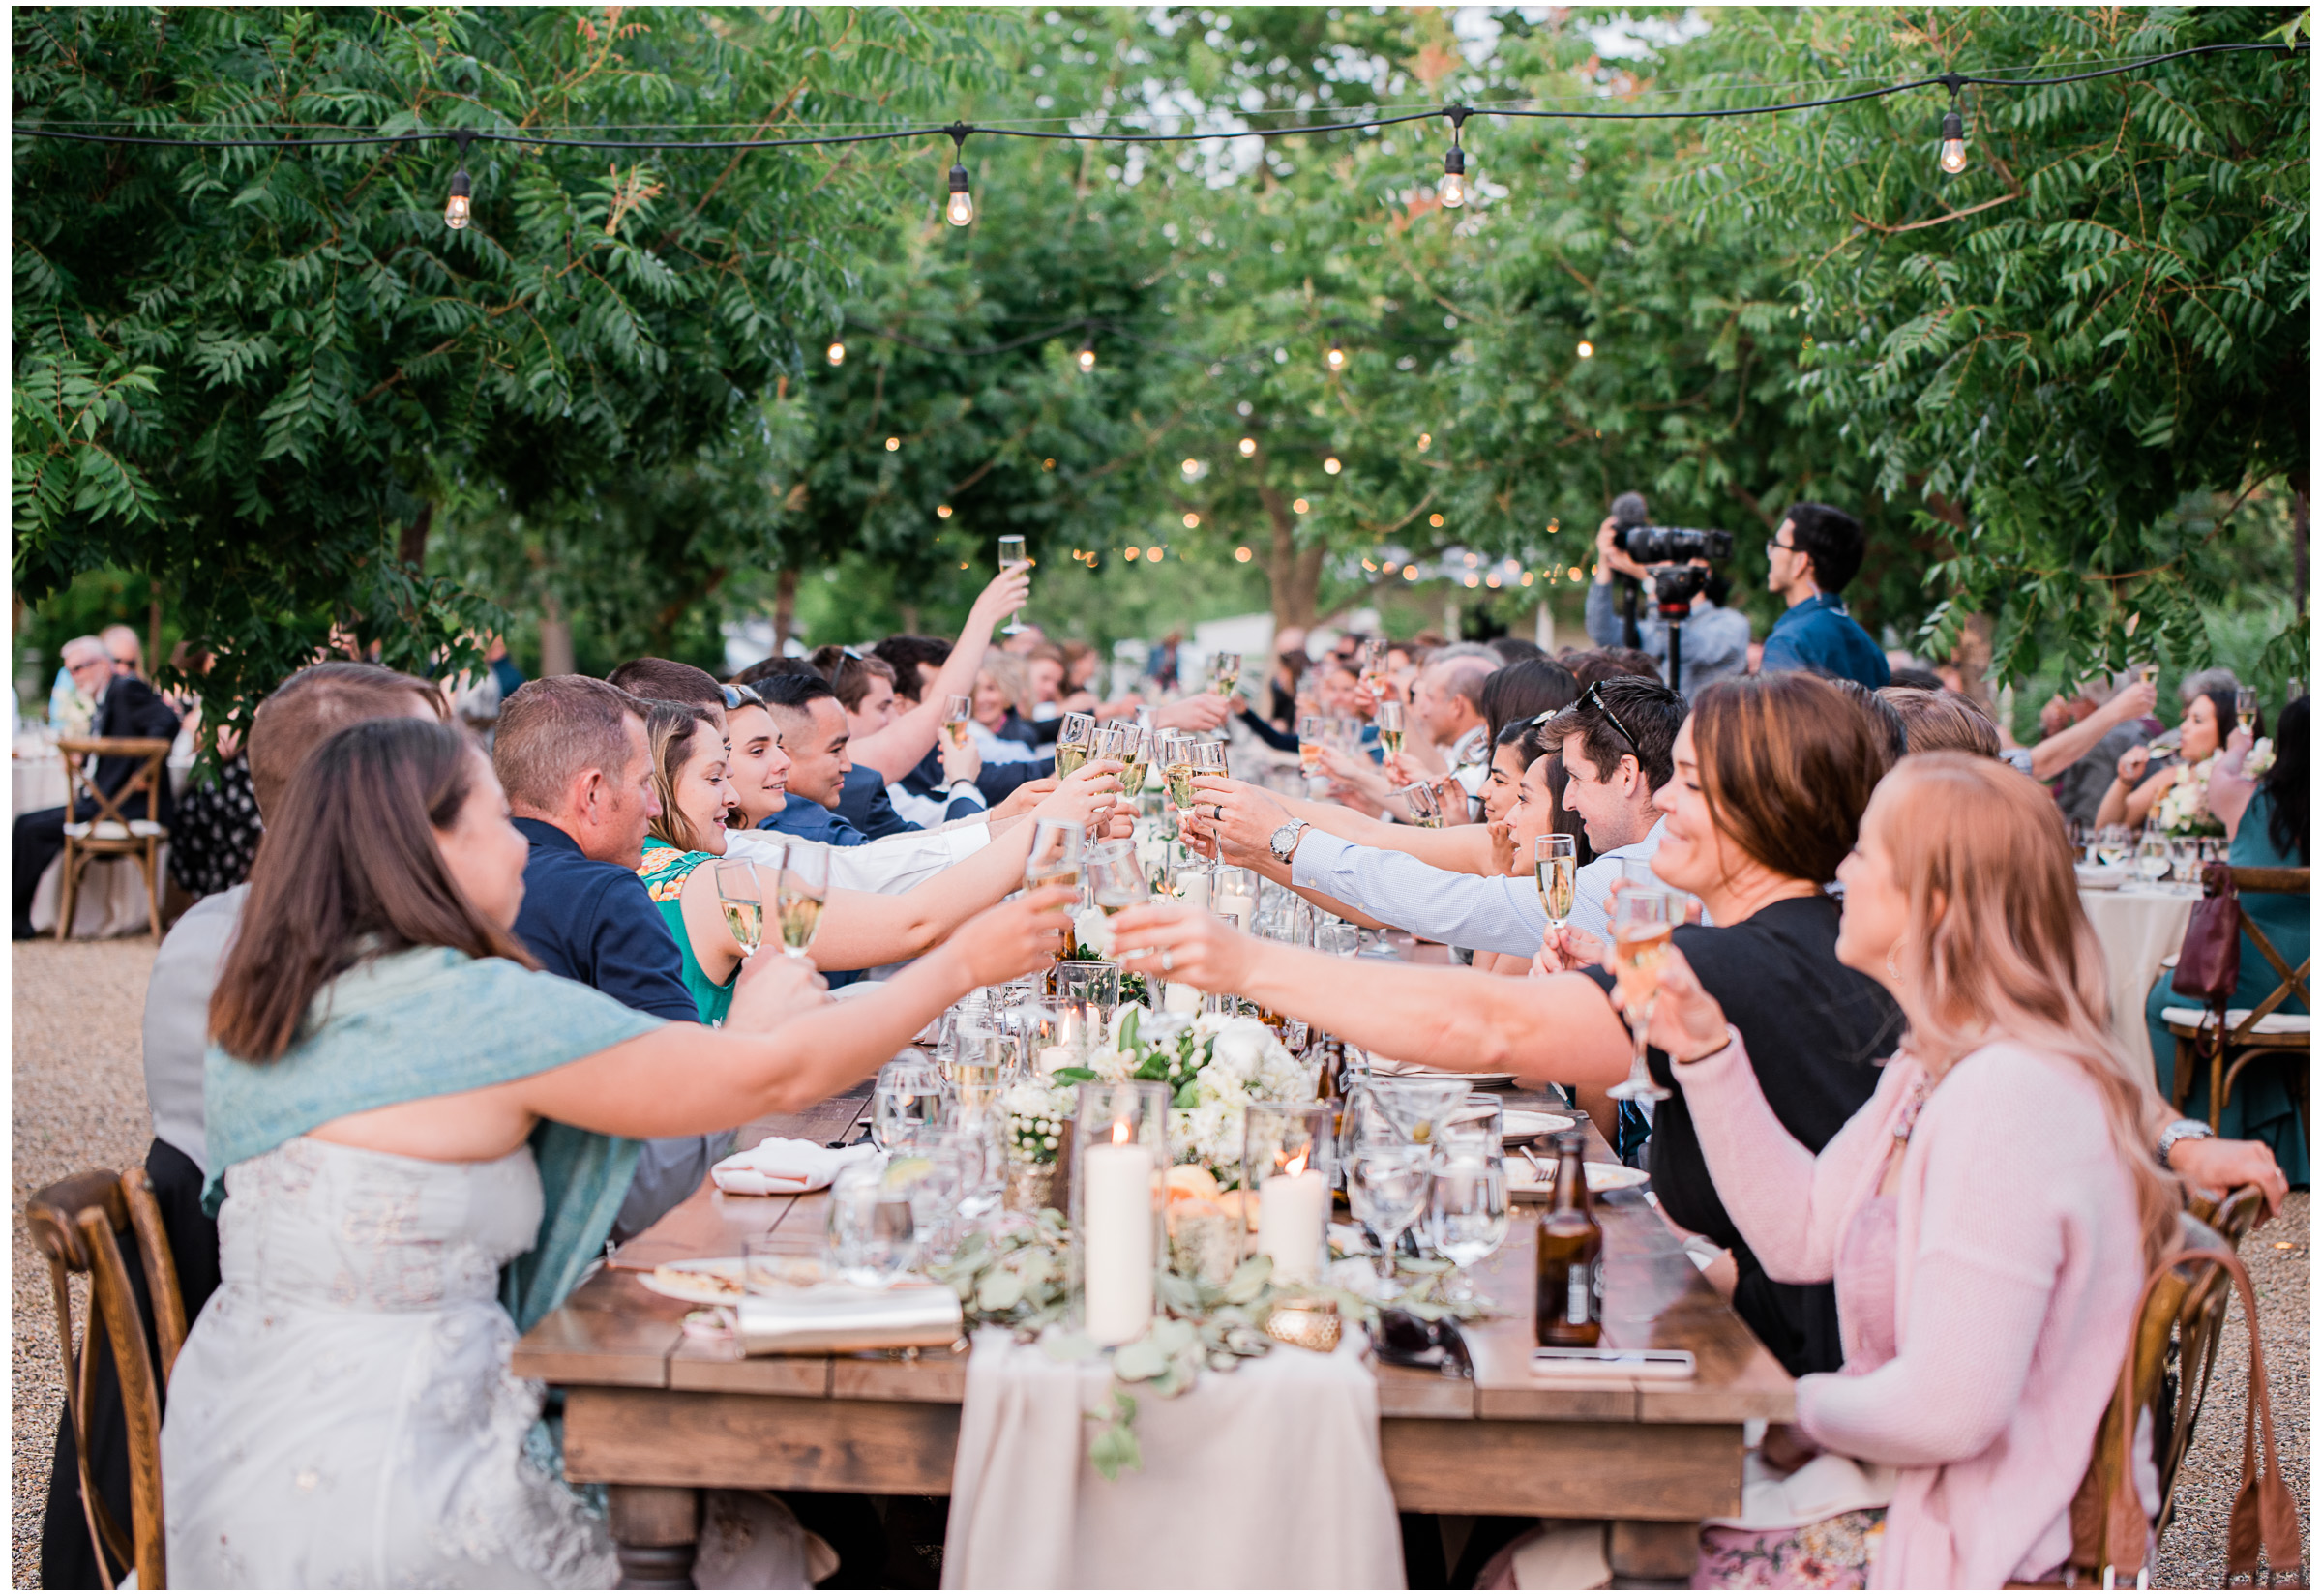 Winters Wedding - Sacramento Photographer - Field & Pond - Justin Wilcox Photography - 32.jpg